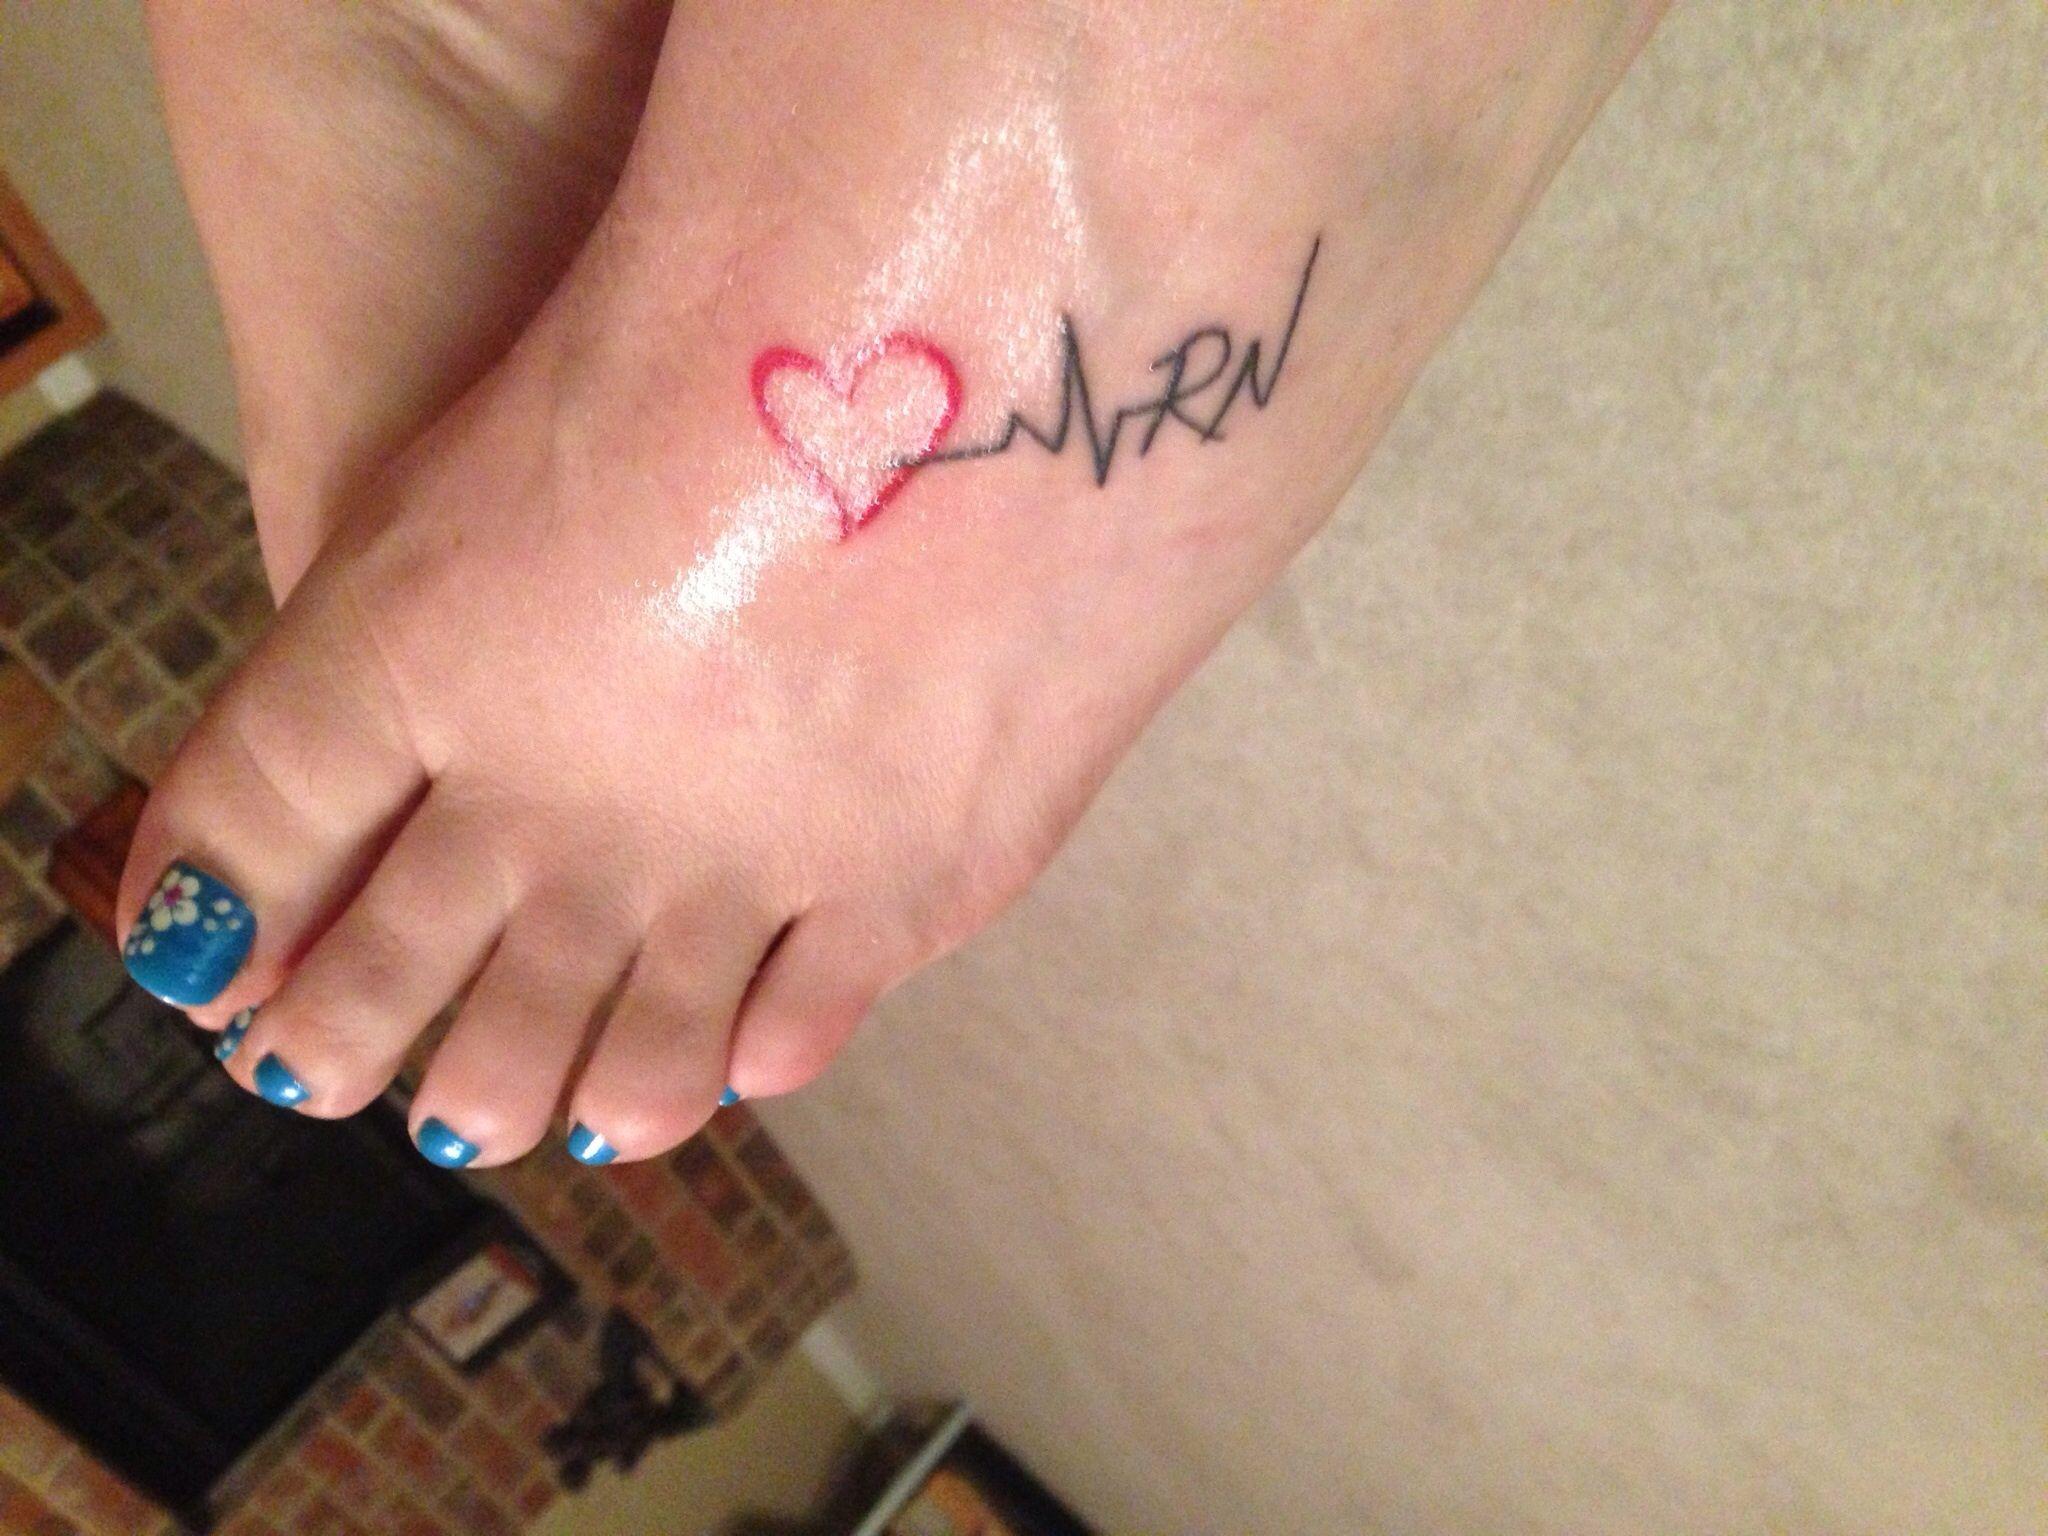 Tattoos tattoo ideas on pinterest rn - Nurse Tattoos Nursing Body Art Mighty Nurse